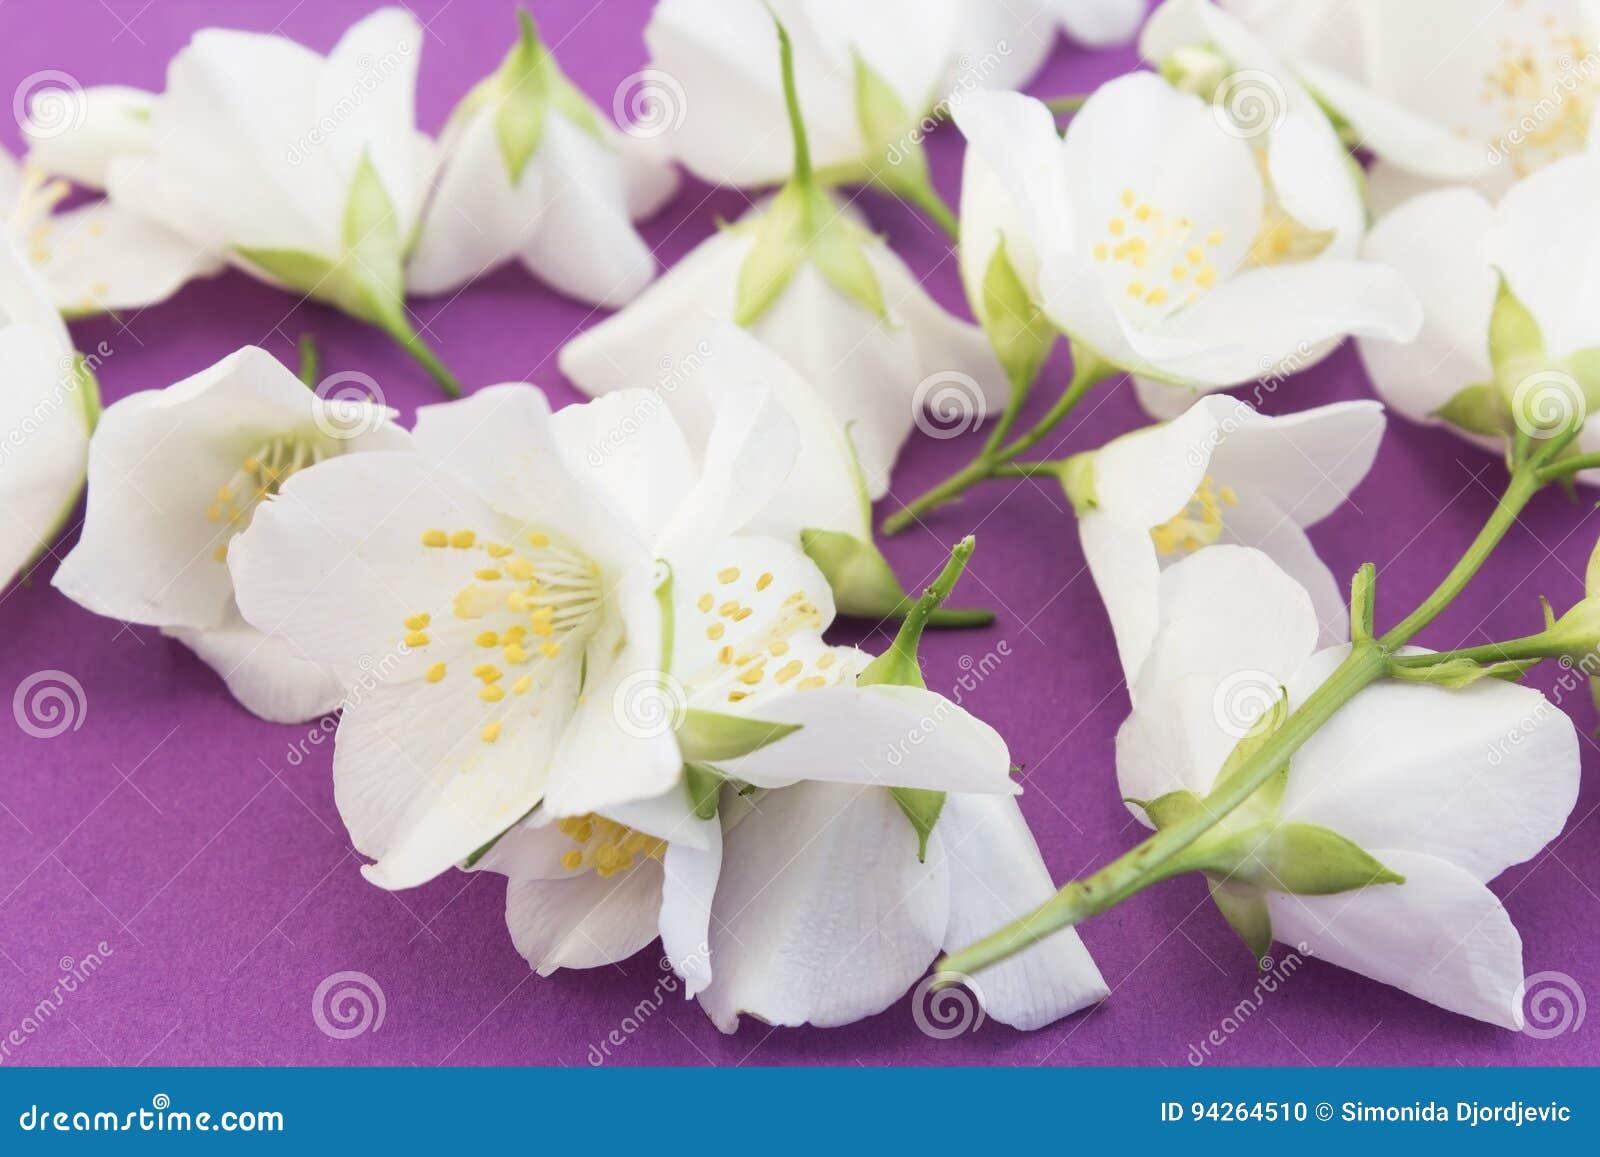 Jasmine on a purple background stock photo image of closeup gift jasmine flowers on a purple background izmirmasajfo